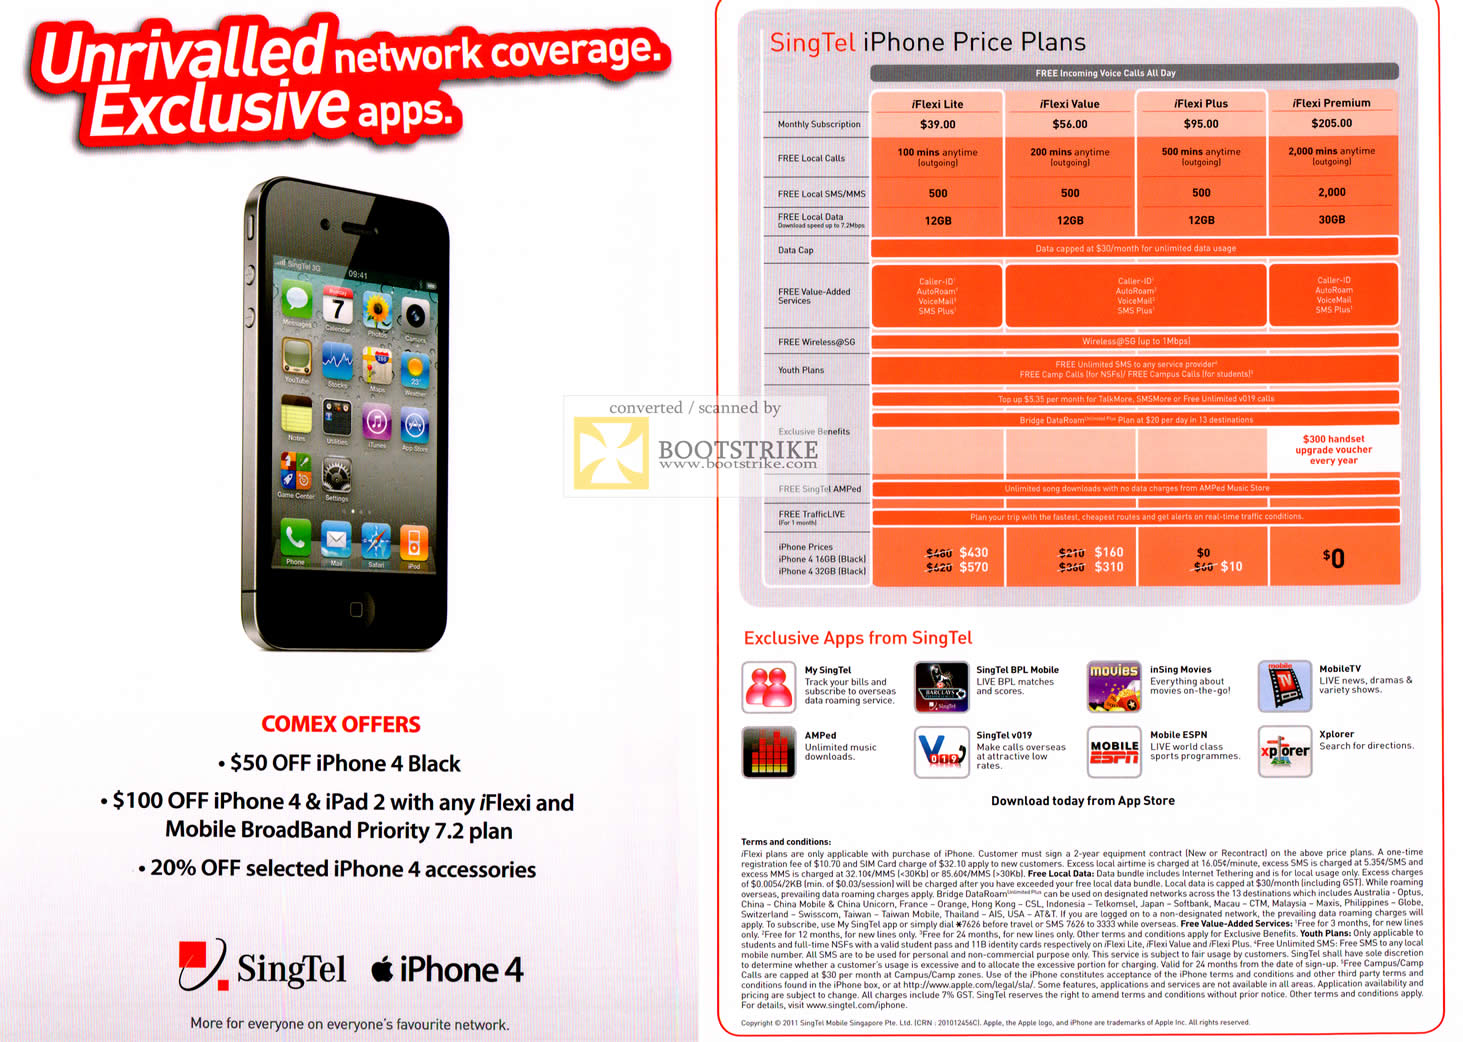 Singtel iPhone 4 Up To 100 Dollar Off iFlexi Mobile Broadband